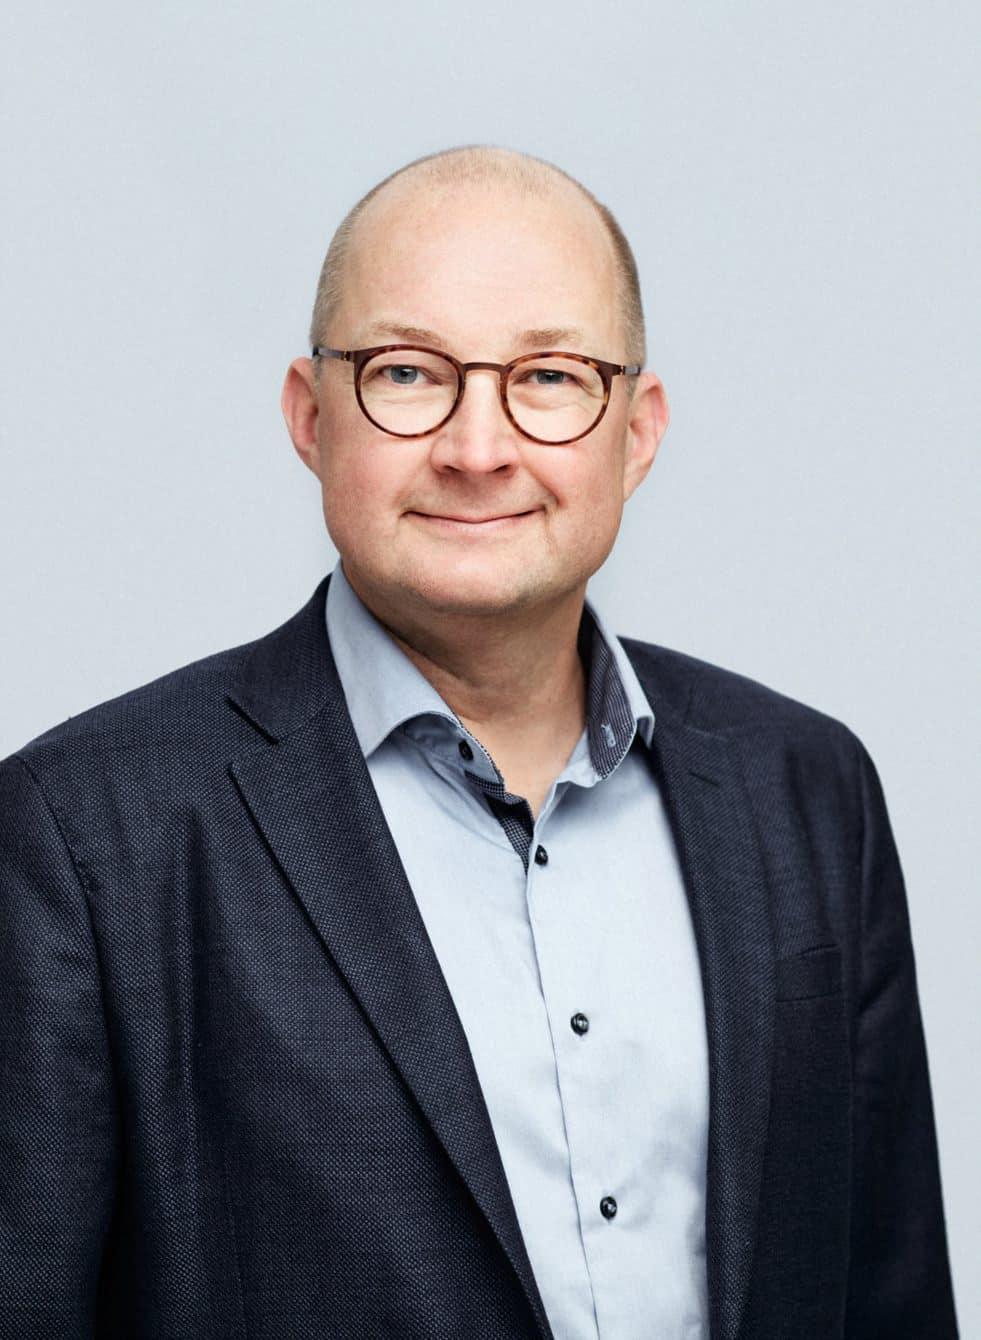 Jens Christian Navarro Poulsen